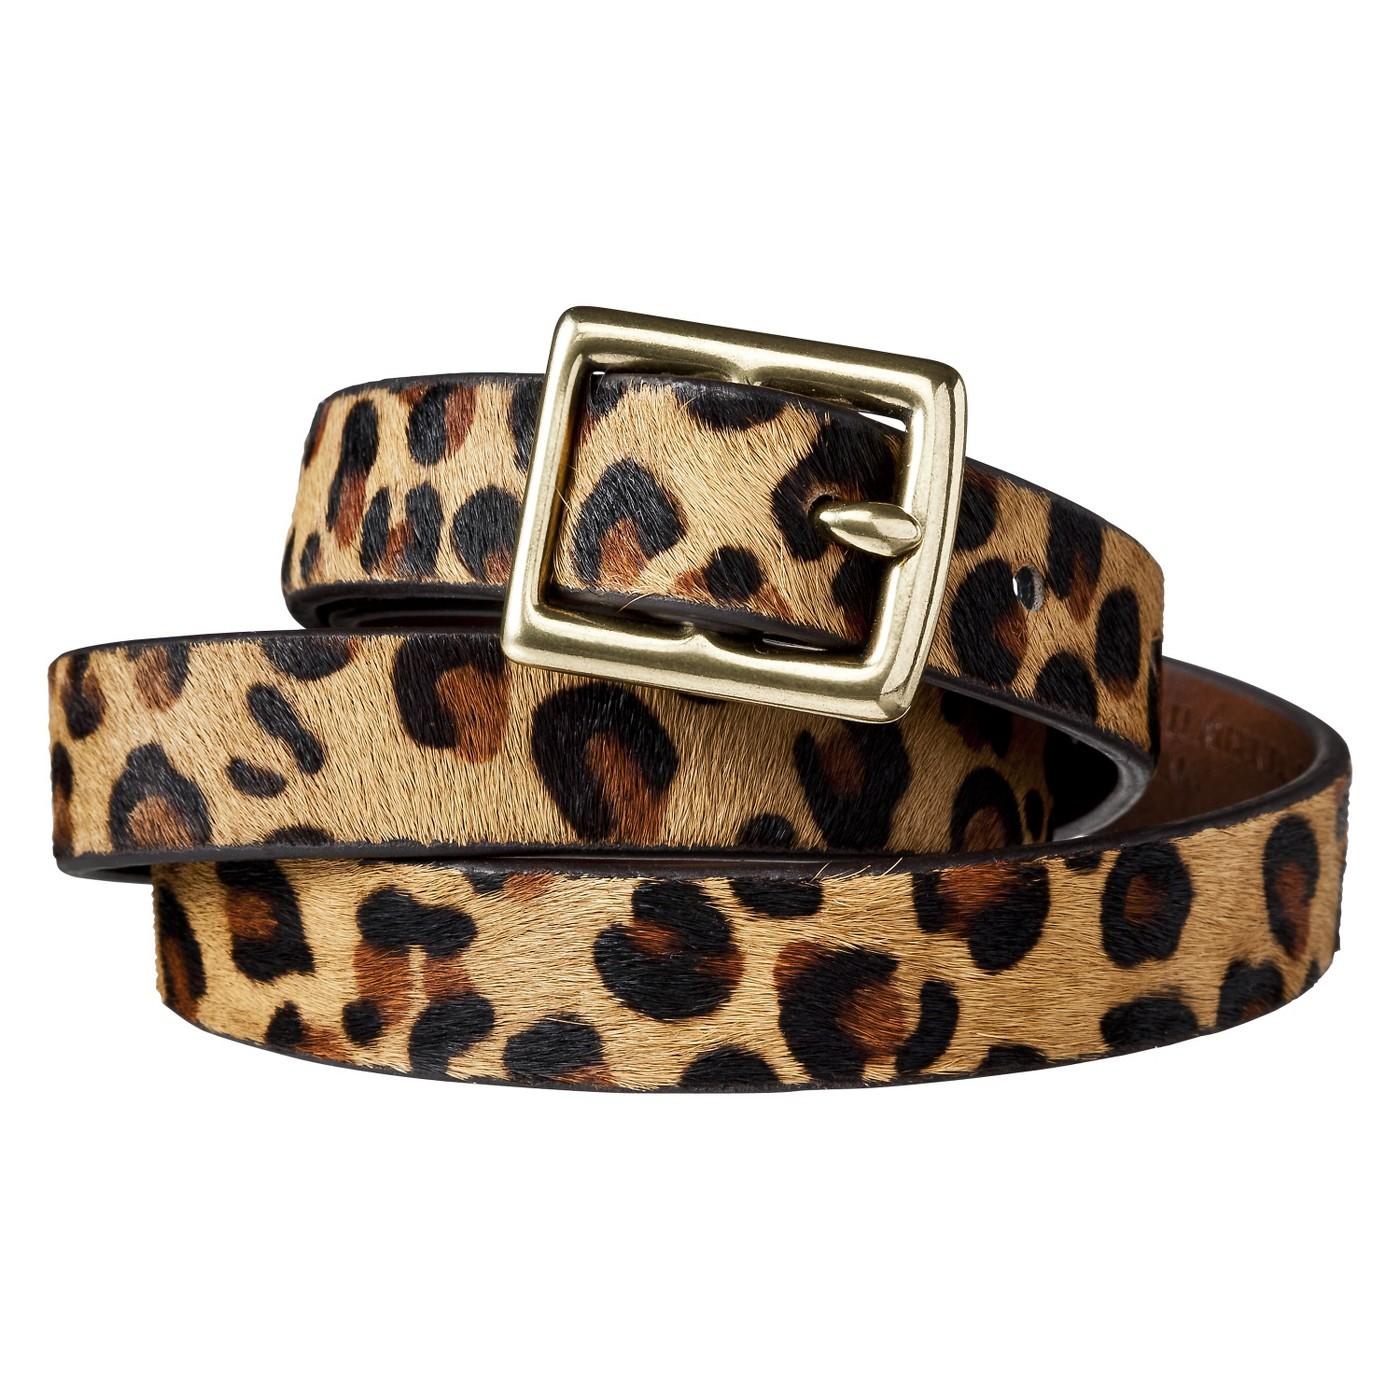 Women's Leopard Print Calf Hair Belt - Brown & Tan - A New Day™ - image 1 of 1